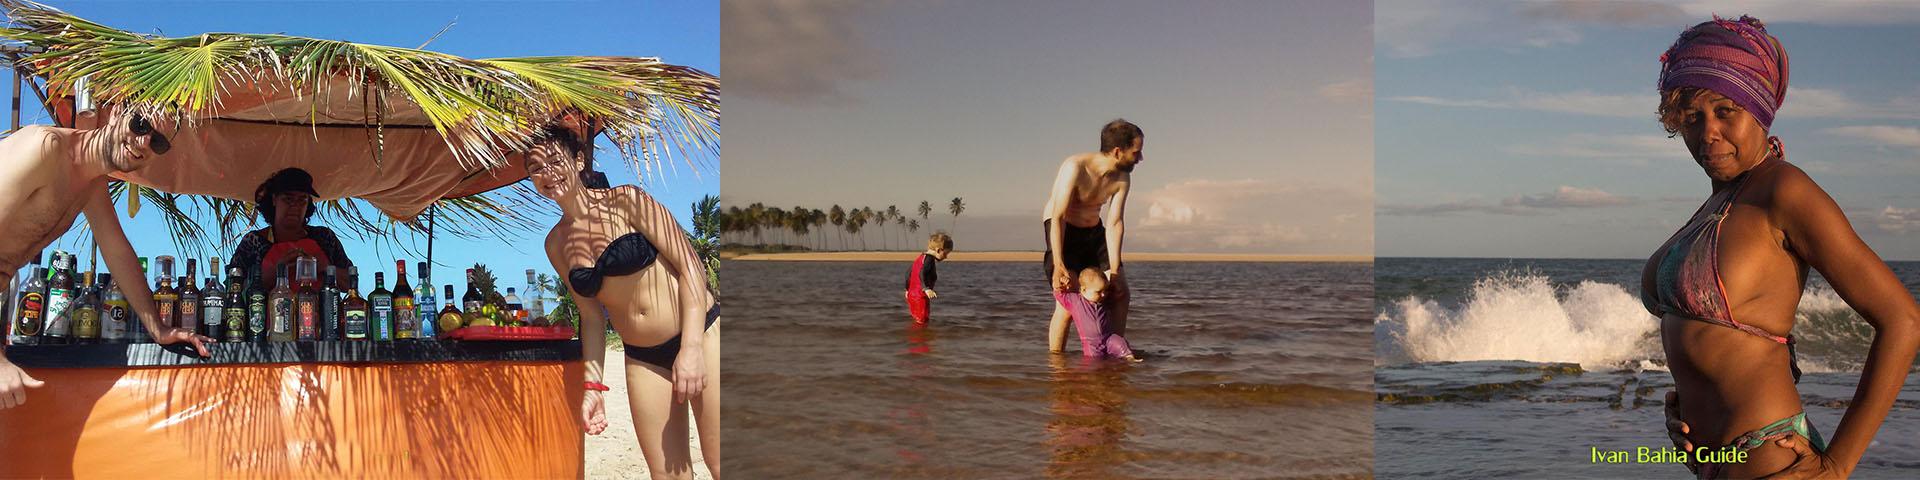 Ivan Bahia Guide - daytour Praia do Forte, Arembepe, Jacuipe aphrodisiac beaches #ivanbahiaguide #ivanbahiareisgids #bestofbrazil #ibg #bahiametisse #fotosbahia #salvadorbahiabrazil #bahiatourism #ibtg  #ivansalvadorbahia #salvadorbahiatravel #toursbylocals #fernandobingretourguide #fotoschapadadiamantina  #chapadadiamantinatransfer #SalvadorTourGuide #chapadadiamantinatrekking #lencois #lençois #gaytravelbrazil #homotravel #brazilhoneymoon #diamantinamountains #valedopati #valecapao #bahia #morropaiinacio #chapadadiamantinaguide #discoverbrazil #Guidedetourismesalvadorbahiabresil #TransatJacquesVabres #SailingBrazil #maurotours #bahiatopturismo #transfervipsalvador #bahiapremium #booktransfer #maisbahiaturismo #cassiturismo